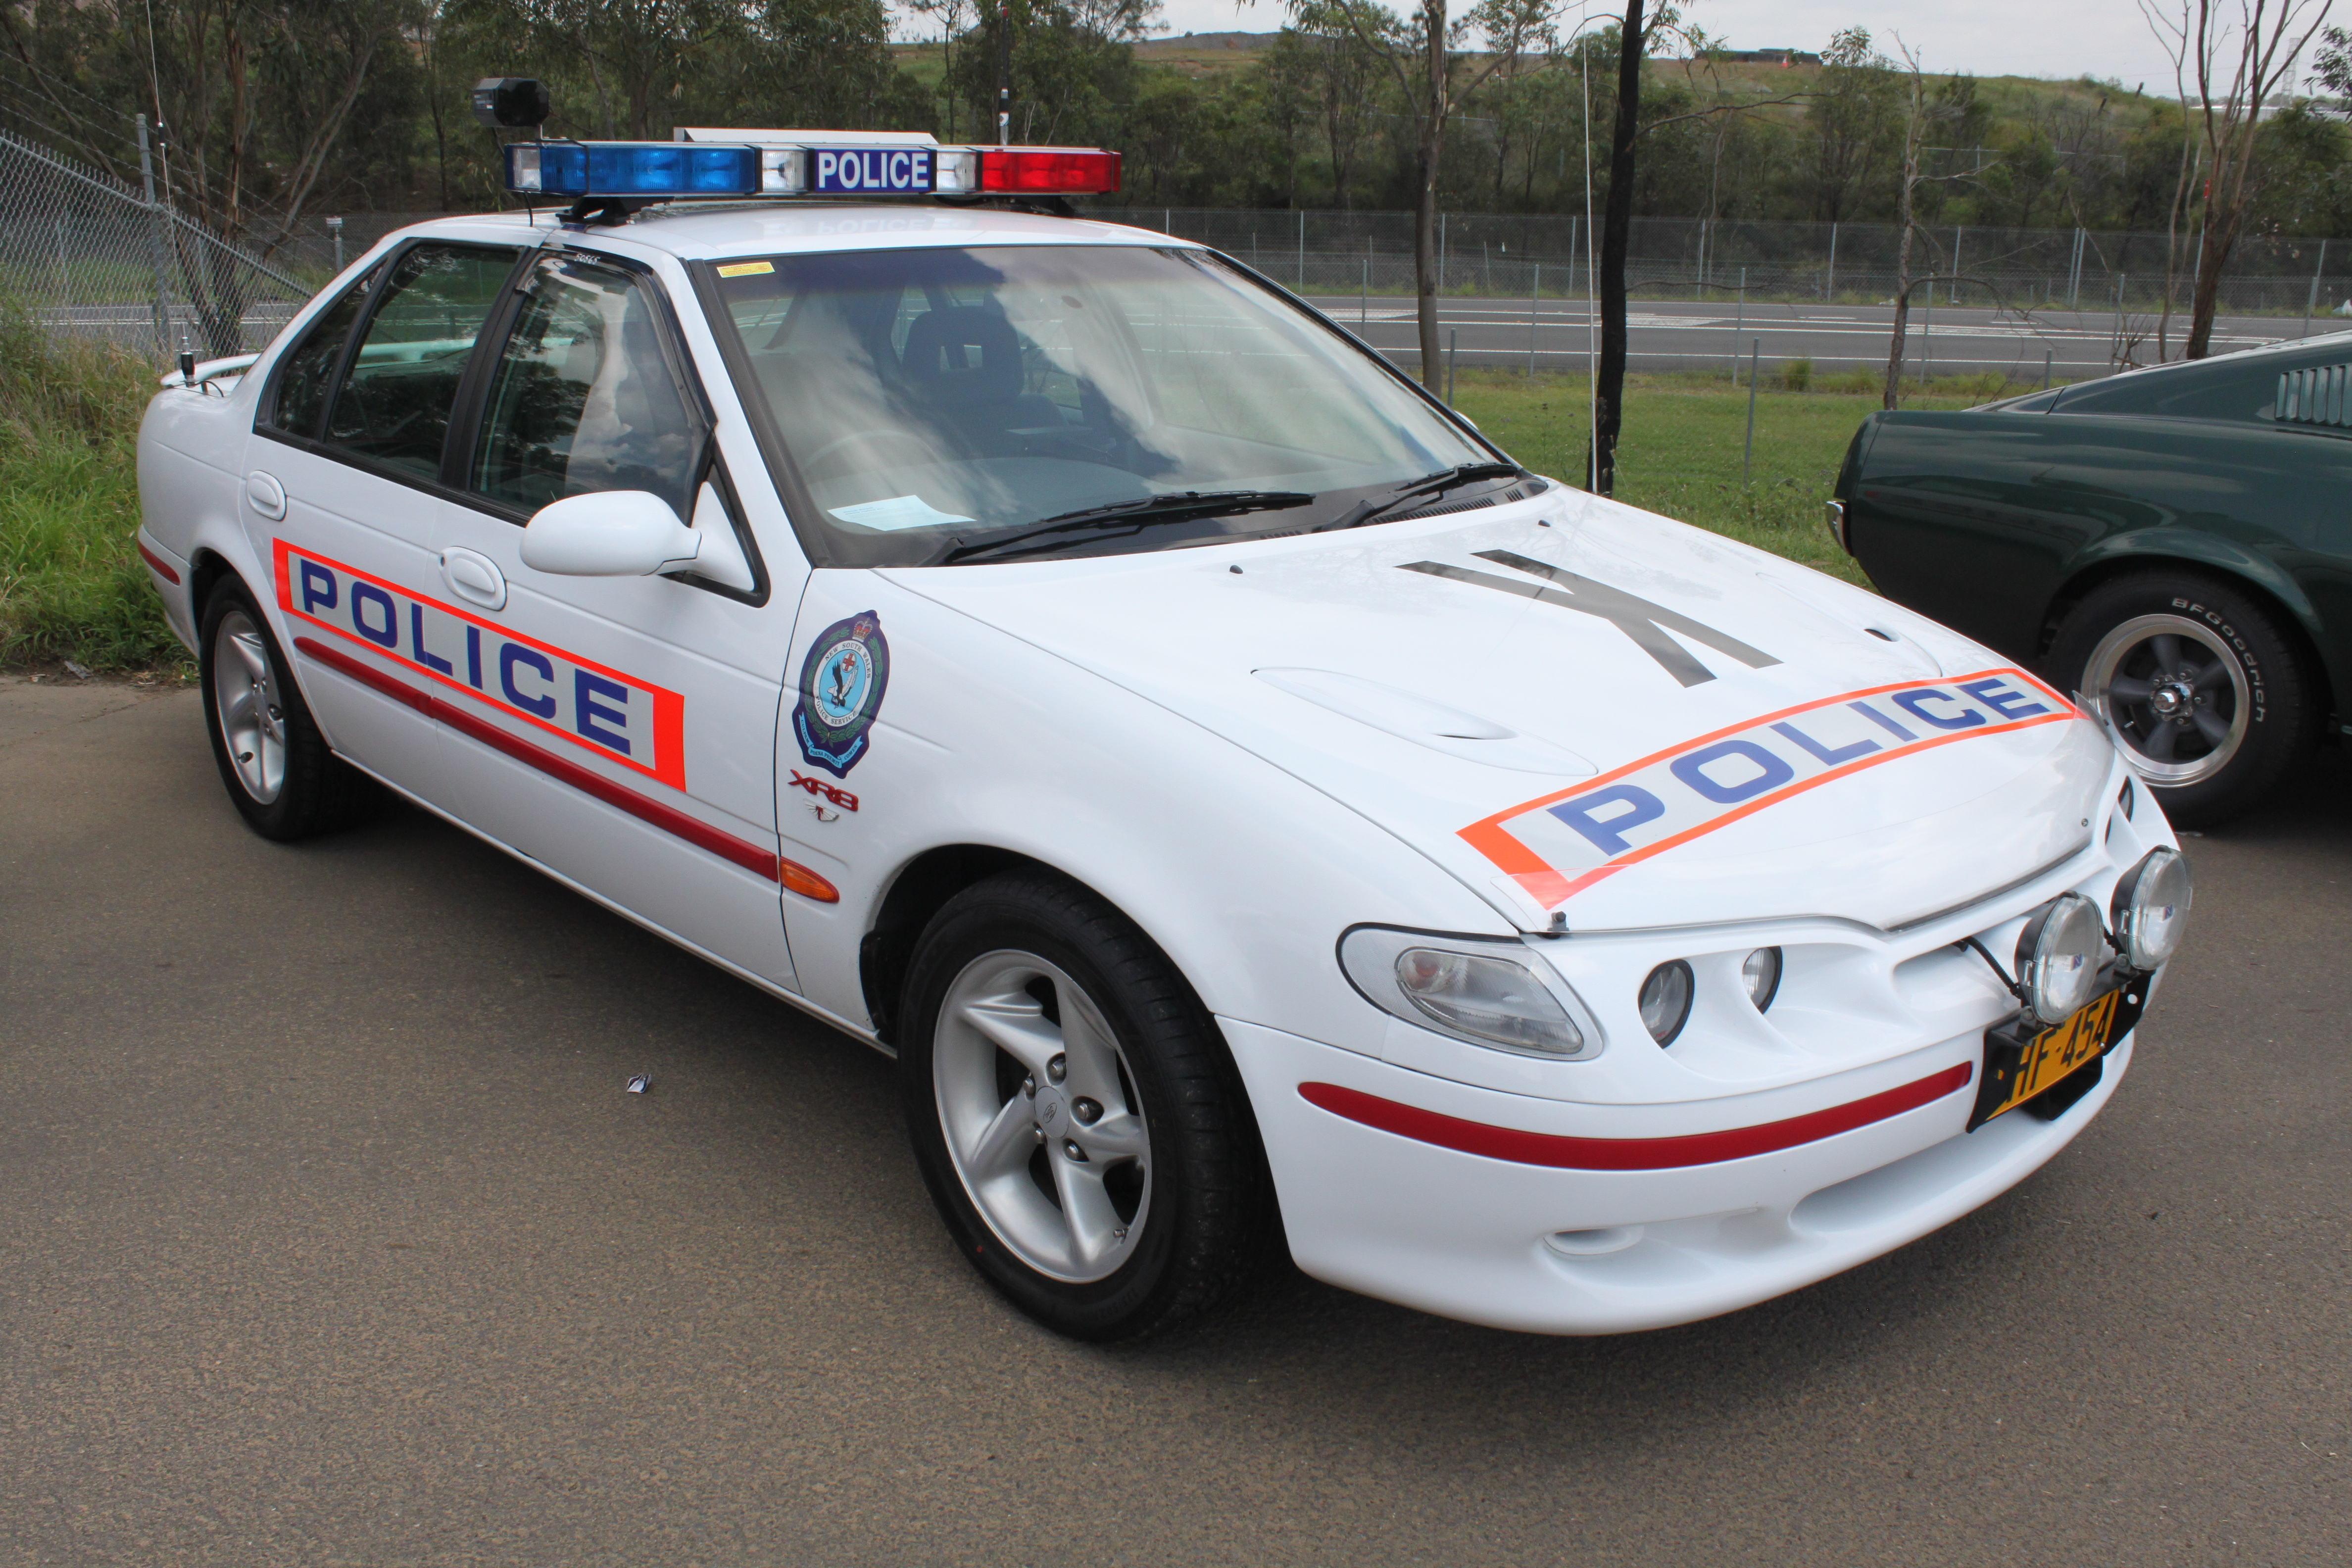 Police Cars Ford Explorer Crownvics And More Mod Gta V